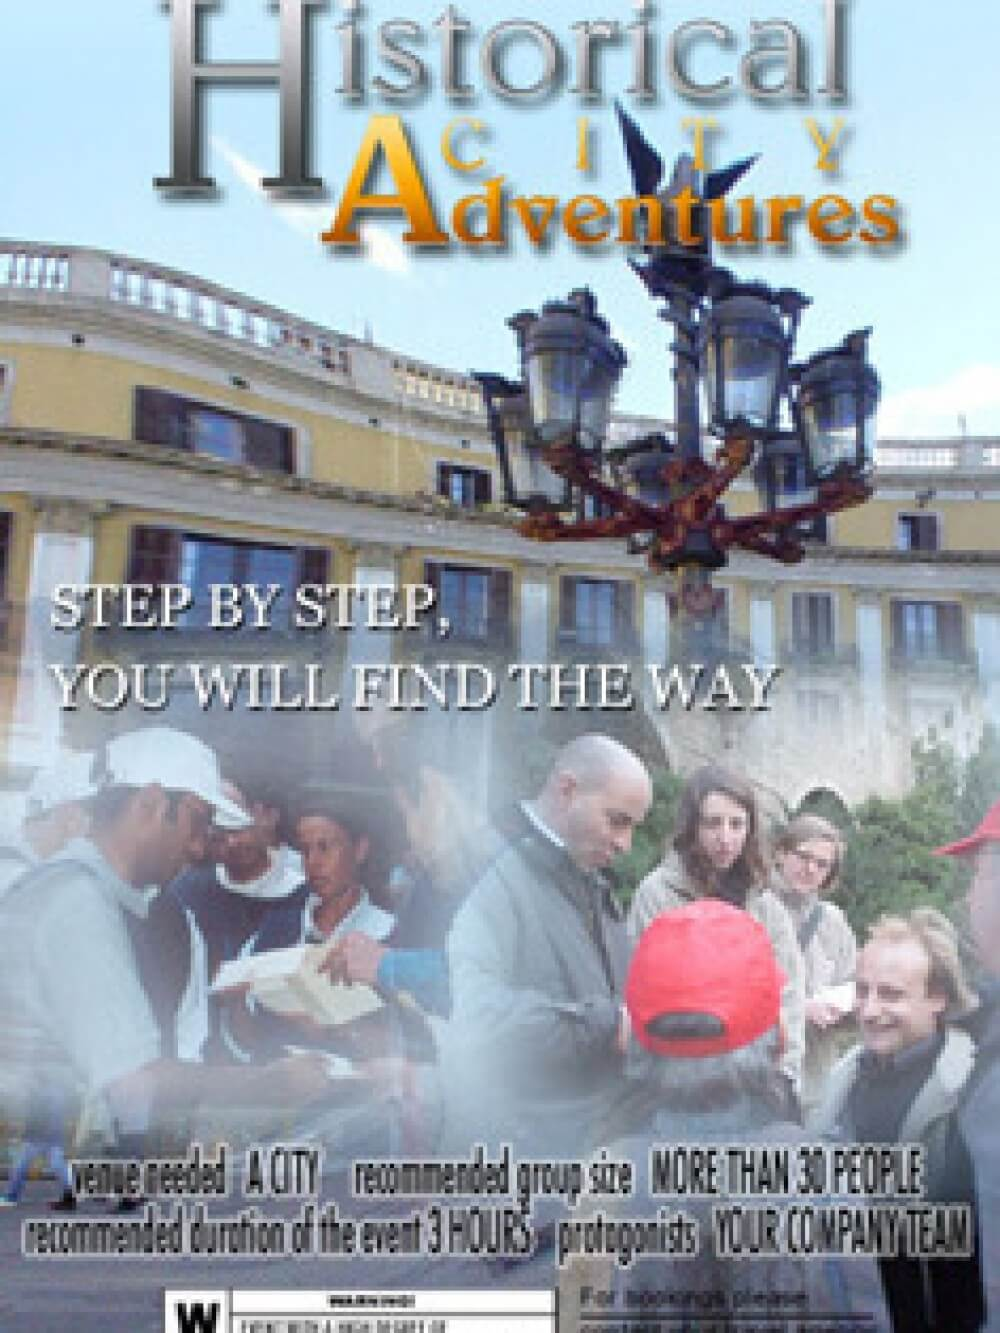 historical_city_adventures_vertical_web